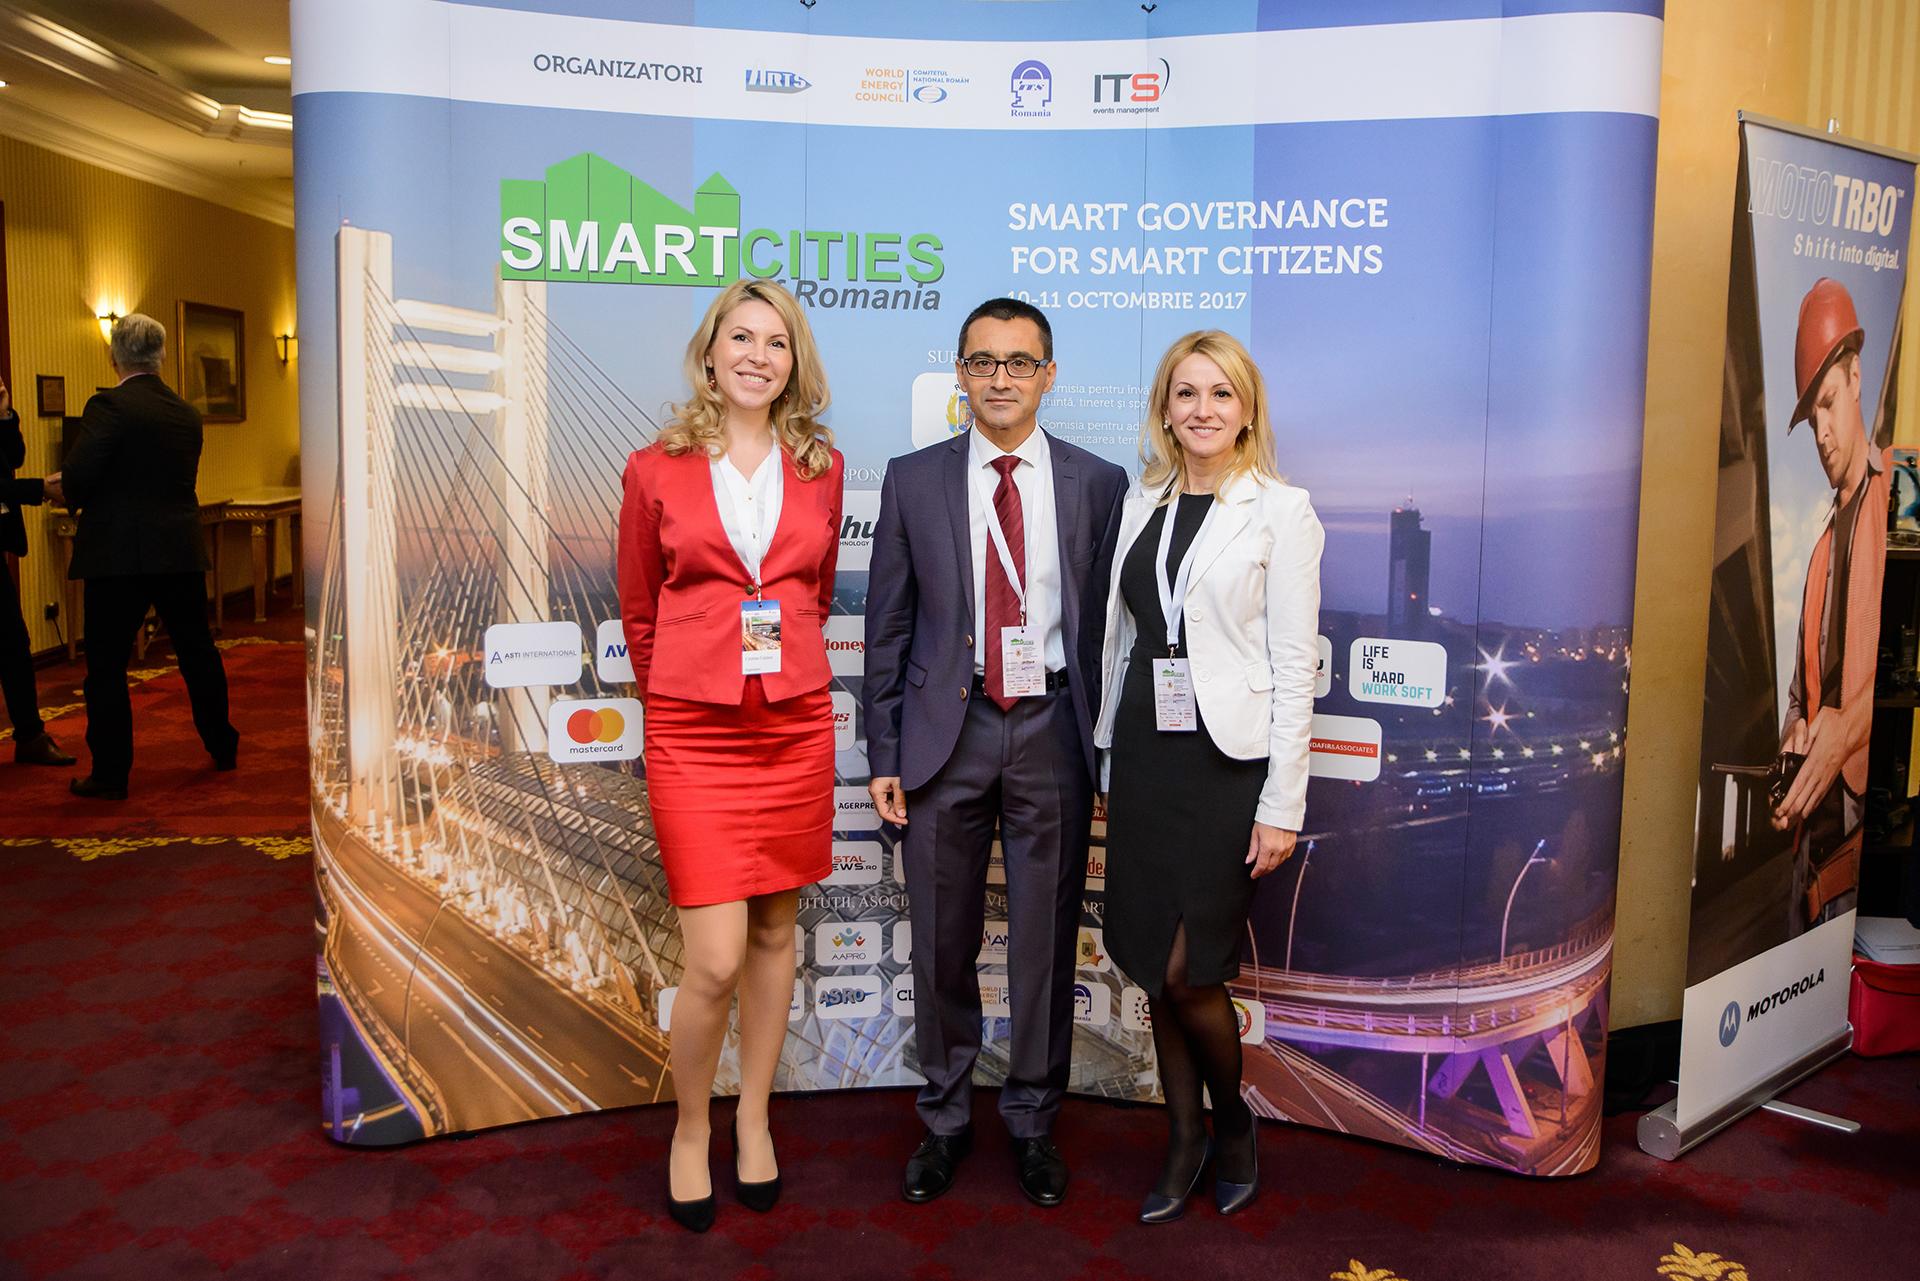 Smart-Cities-Of-Romania-2017---ITS-319